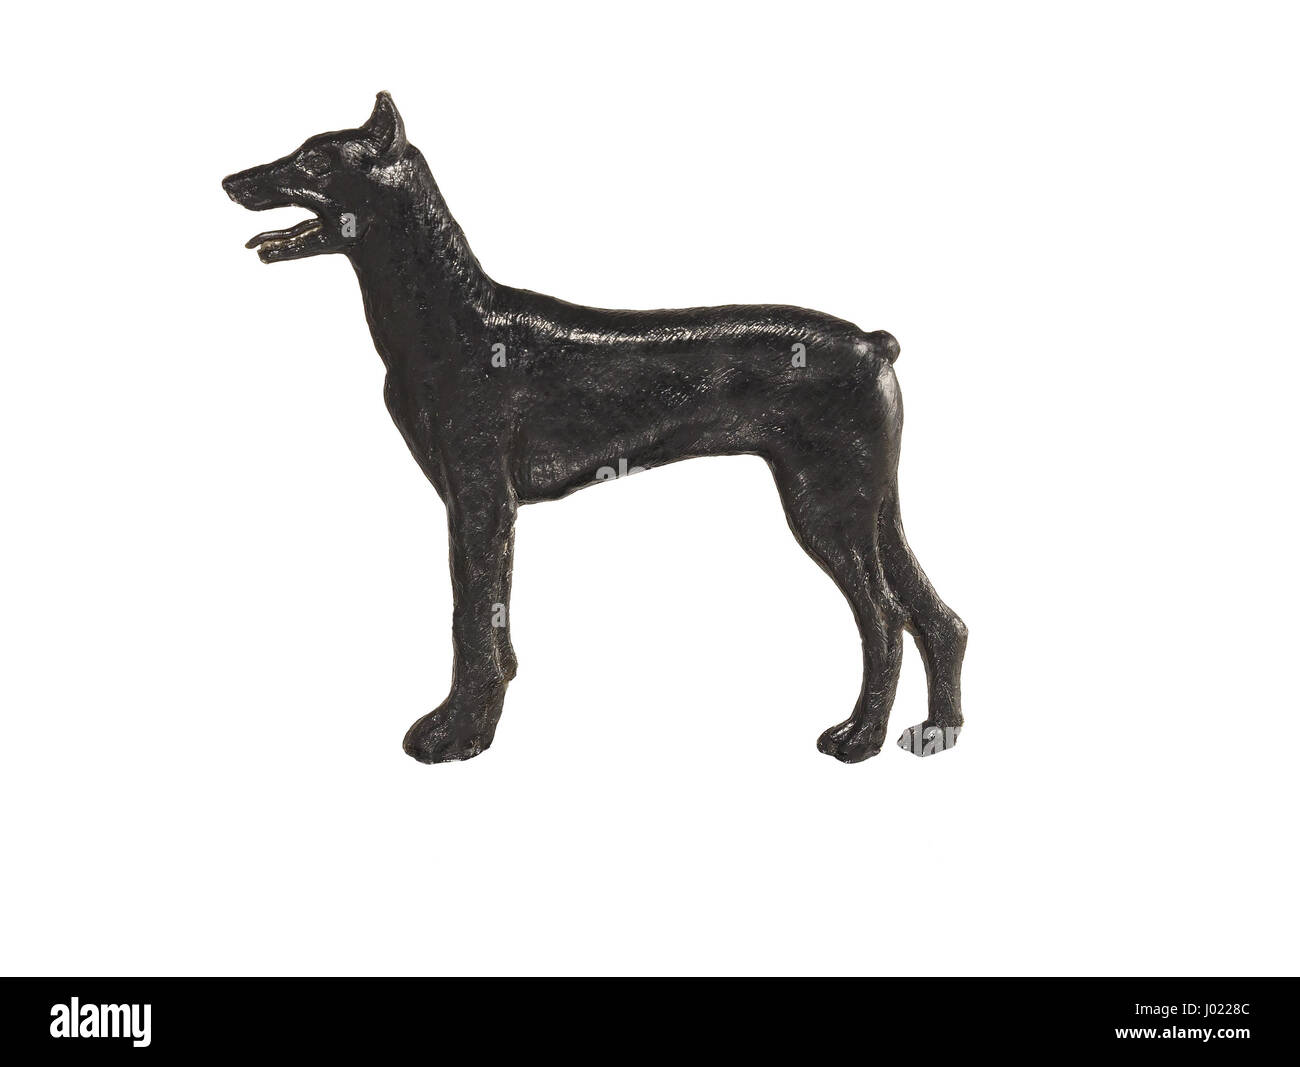 Black dog figure on white background, Doberman Pinscher - Stock Image